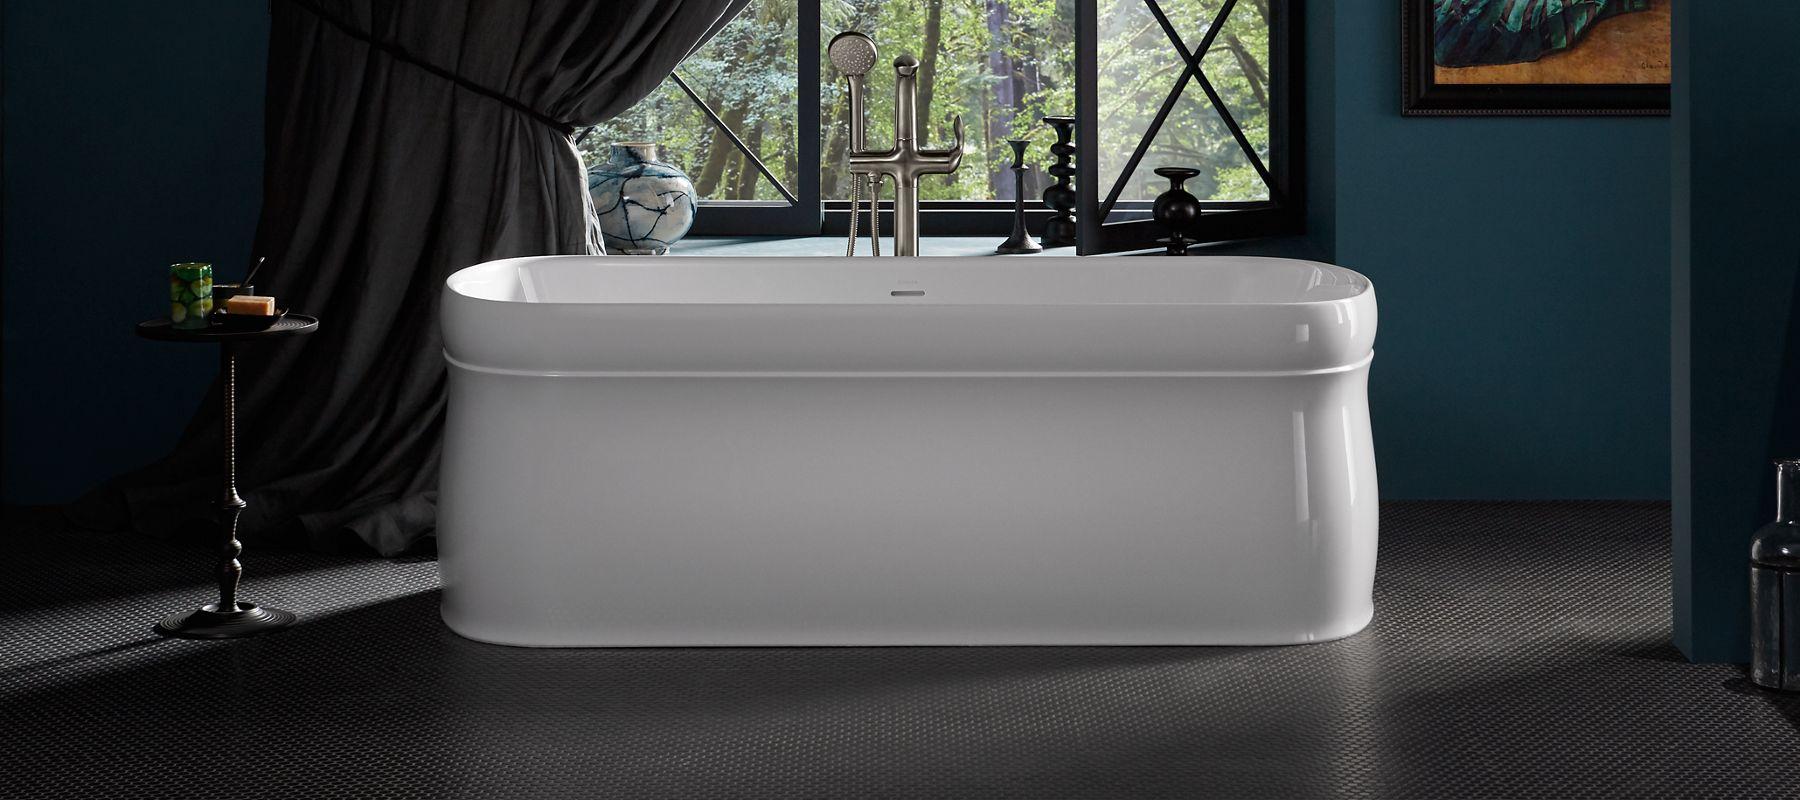 Bathtubs whirlpool bathing products bathroom kohler for How wide is a bathtub